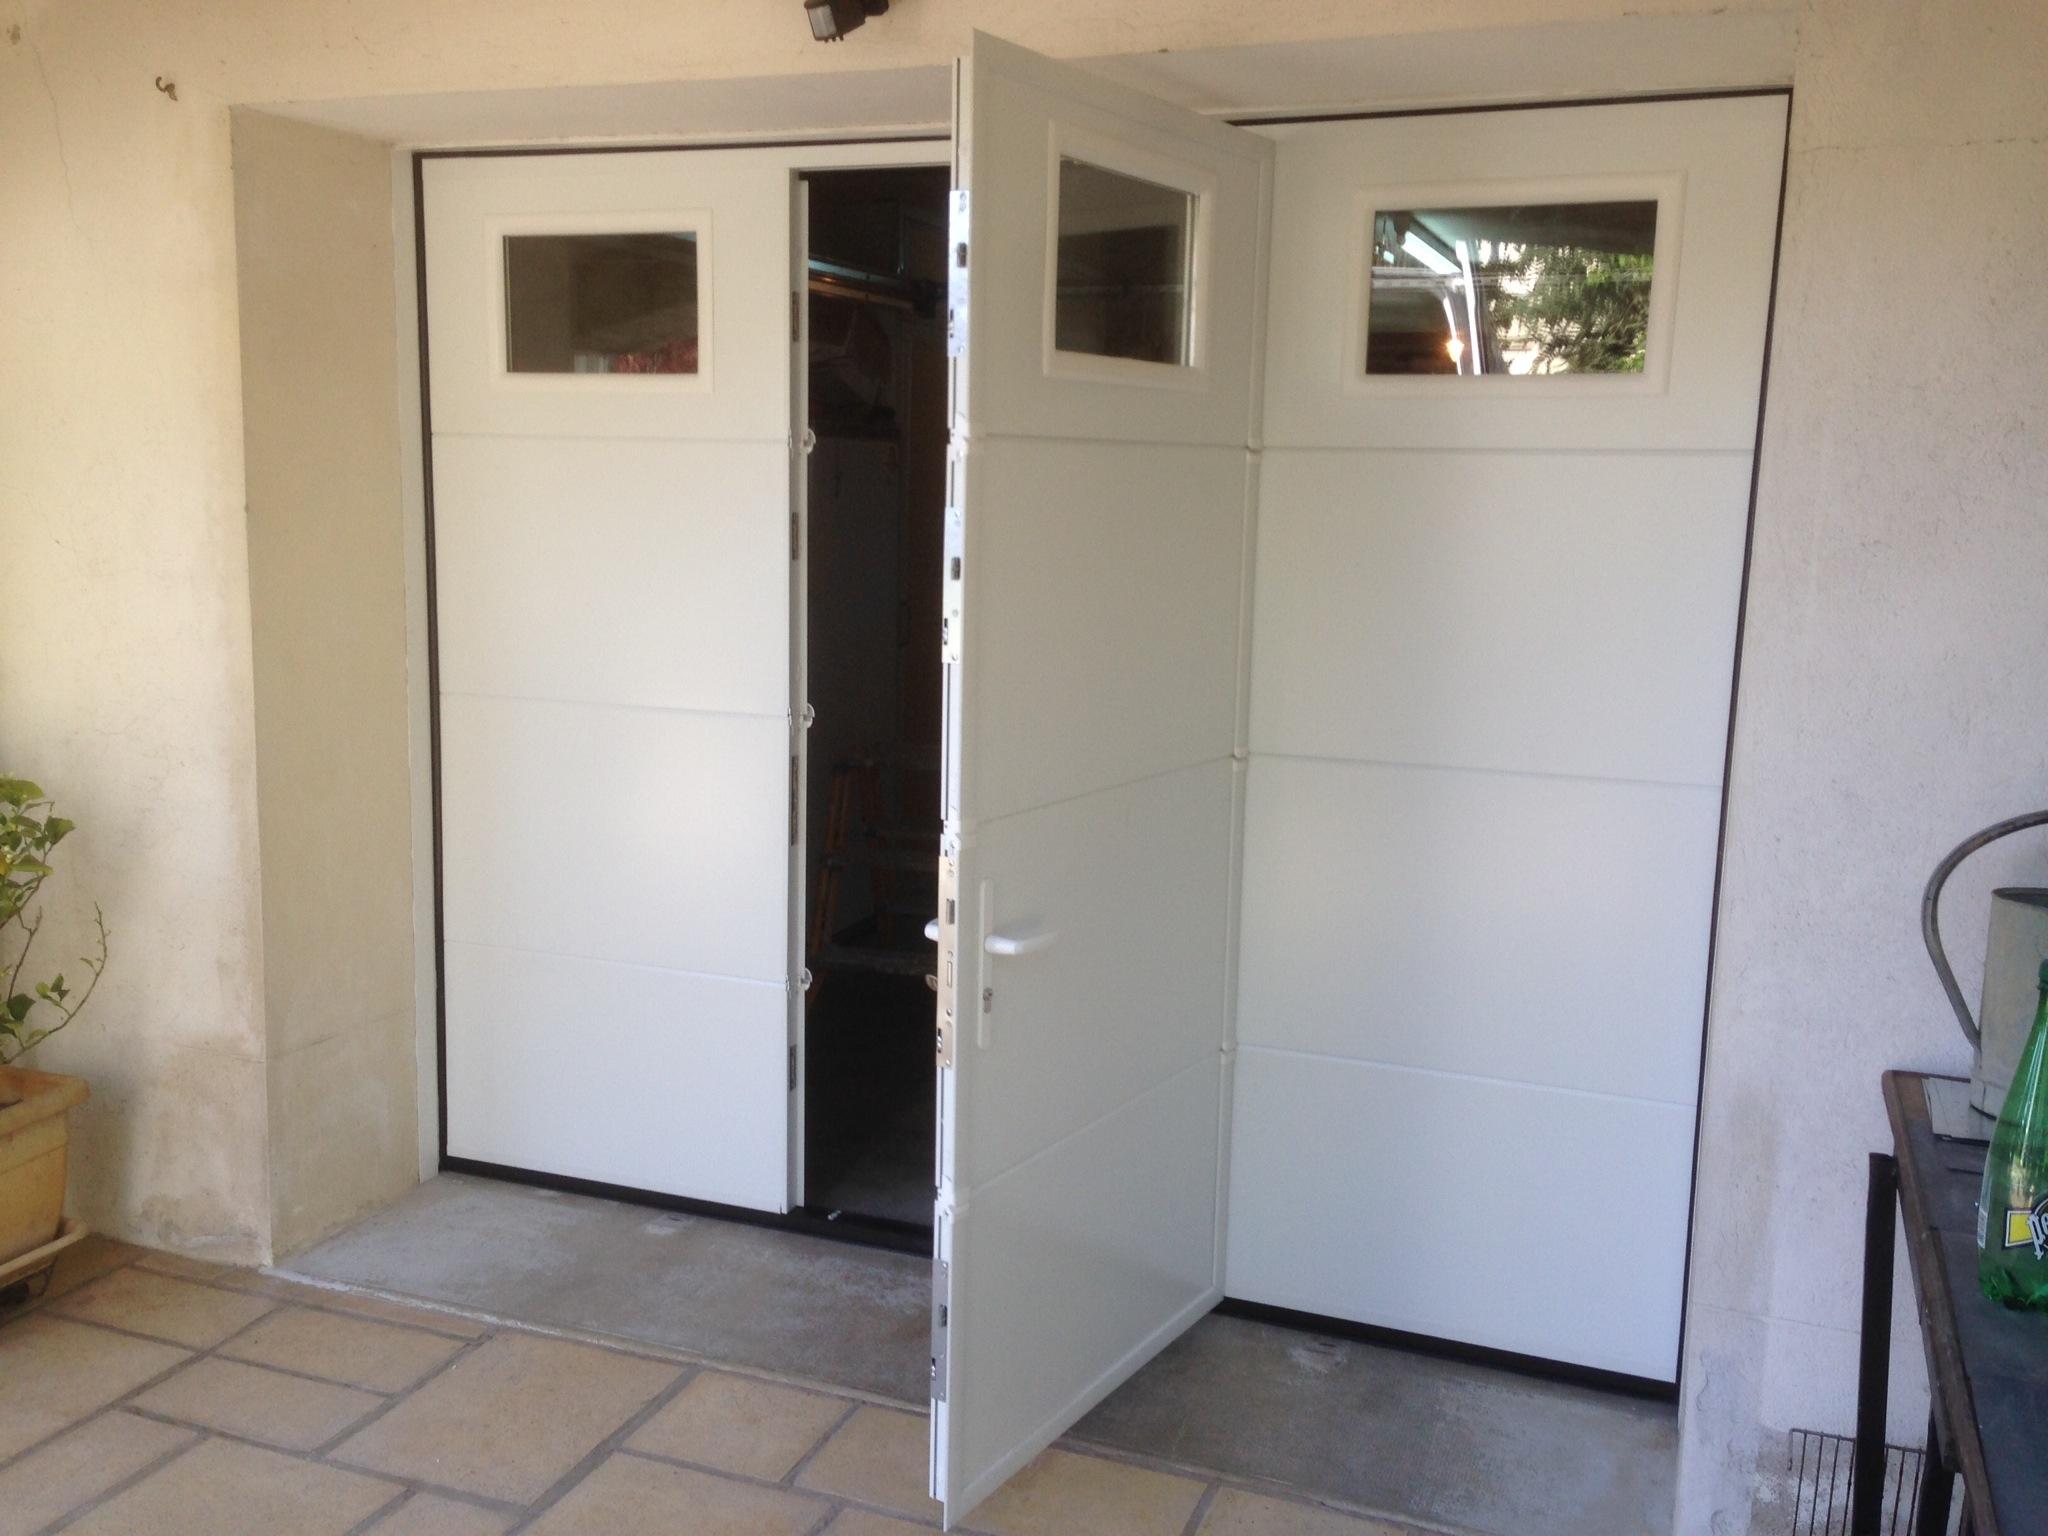 hublot pour porte de garage castorama porte d entr e alu habitat tendance pose de portes d entr. Black Bedroom Furniture Sets. Home Design Ideas